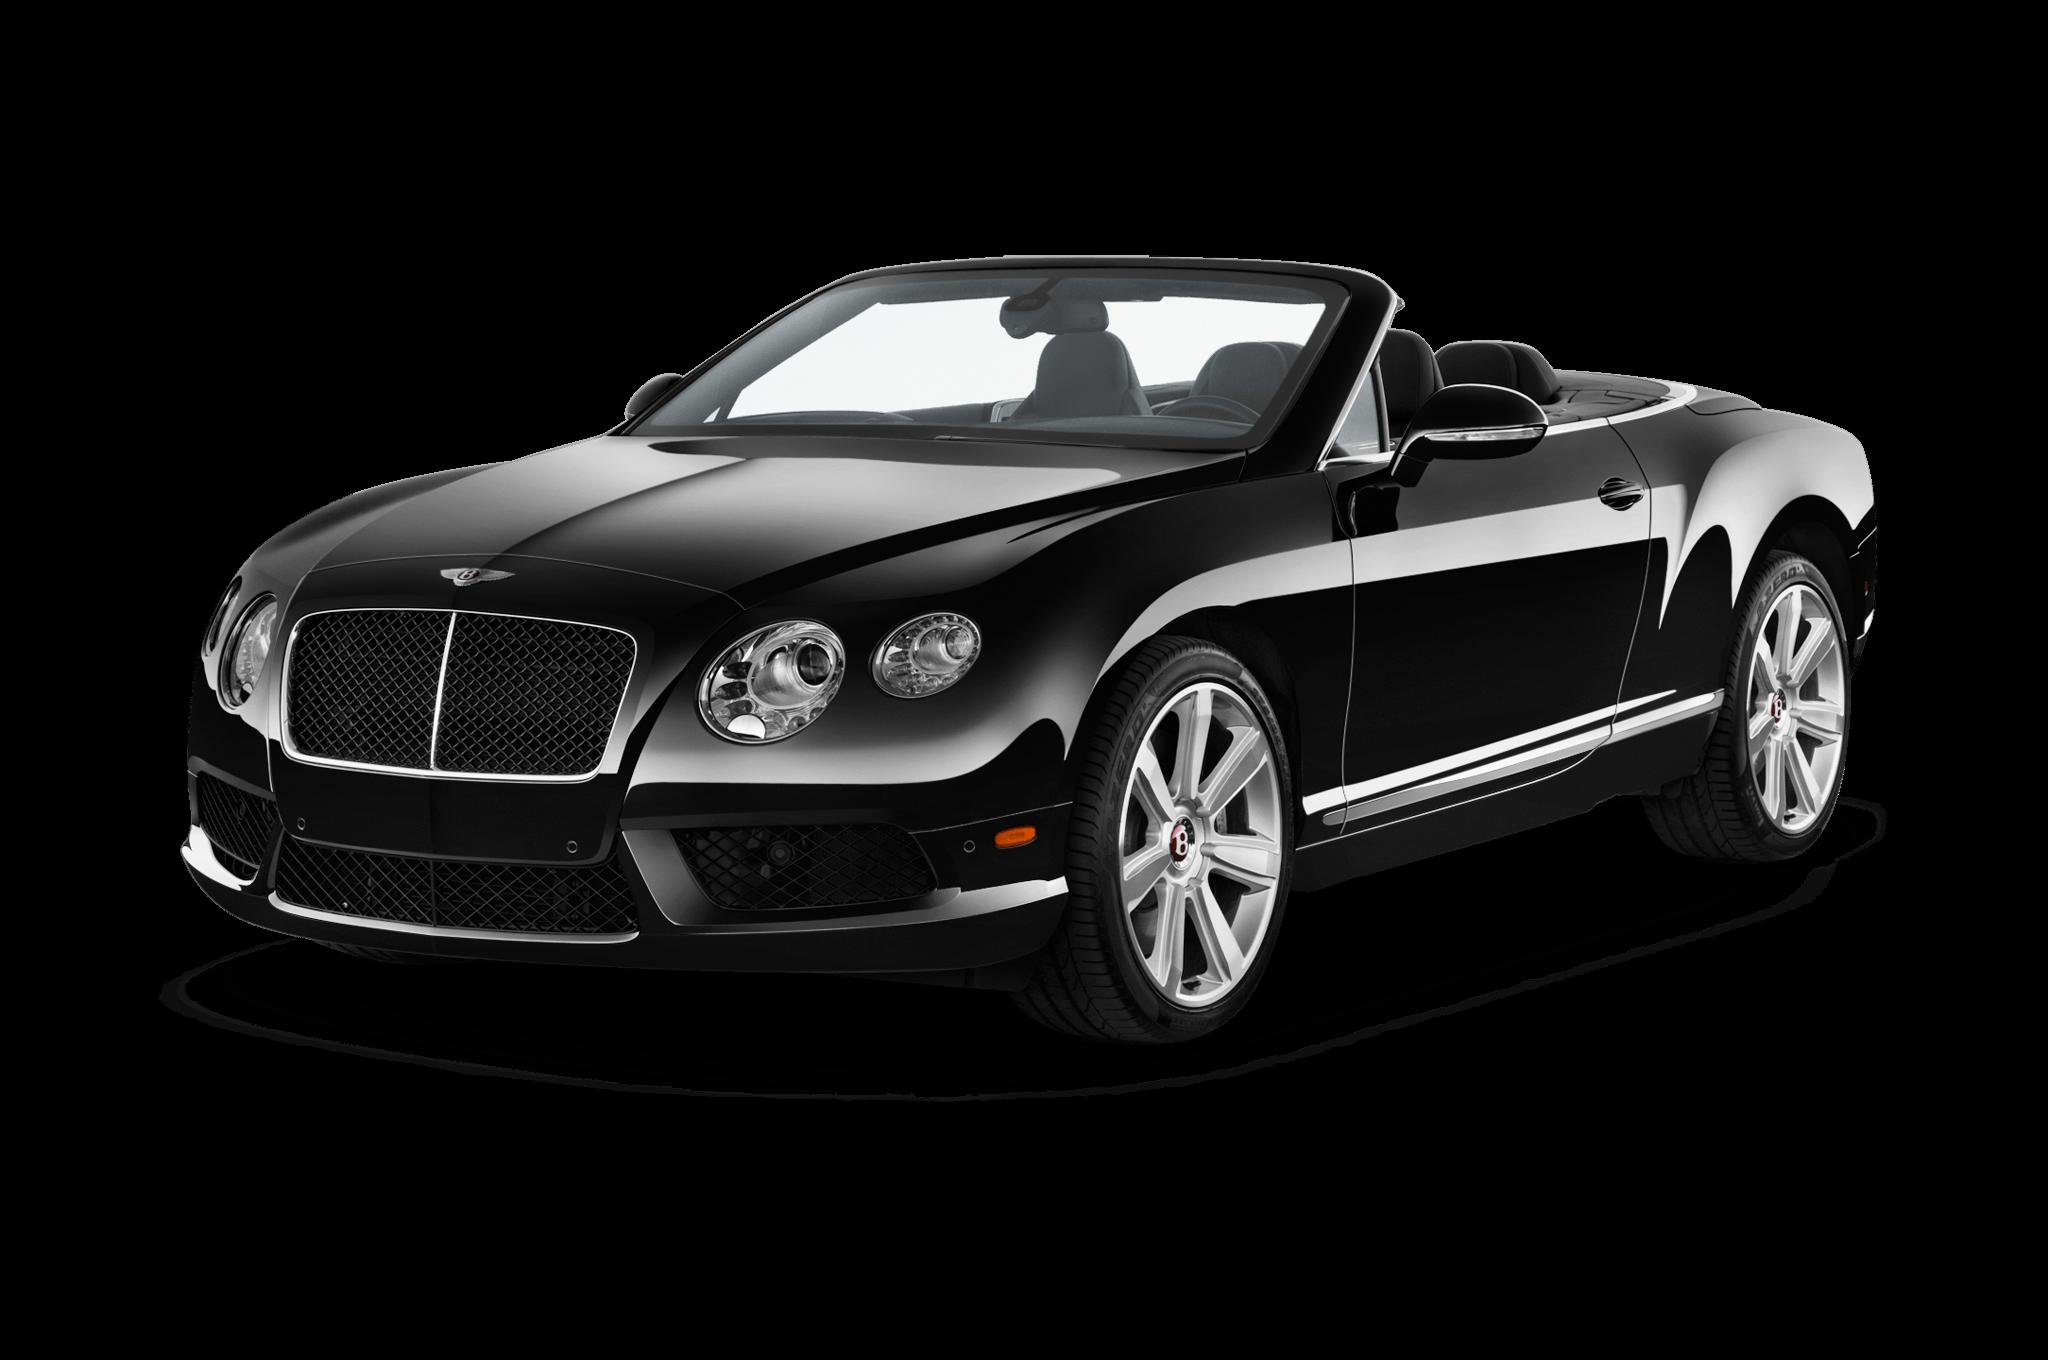 Another Convertible Bentley Transparent Png Stickpng